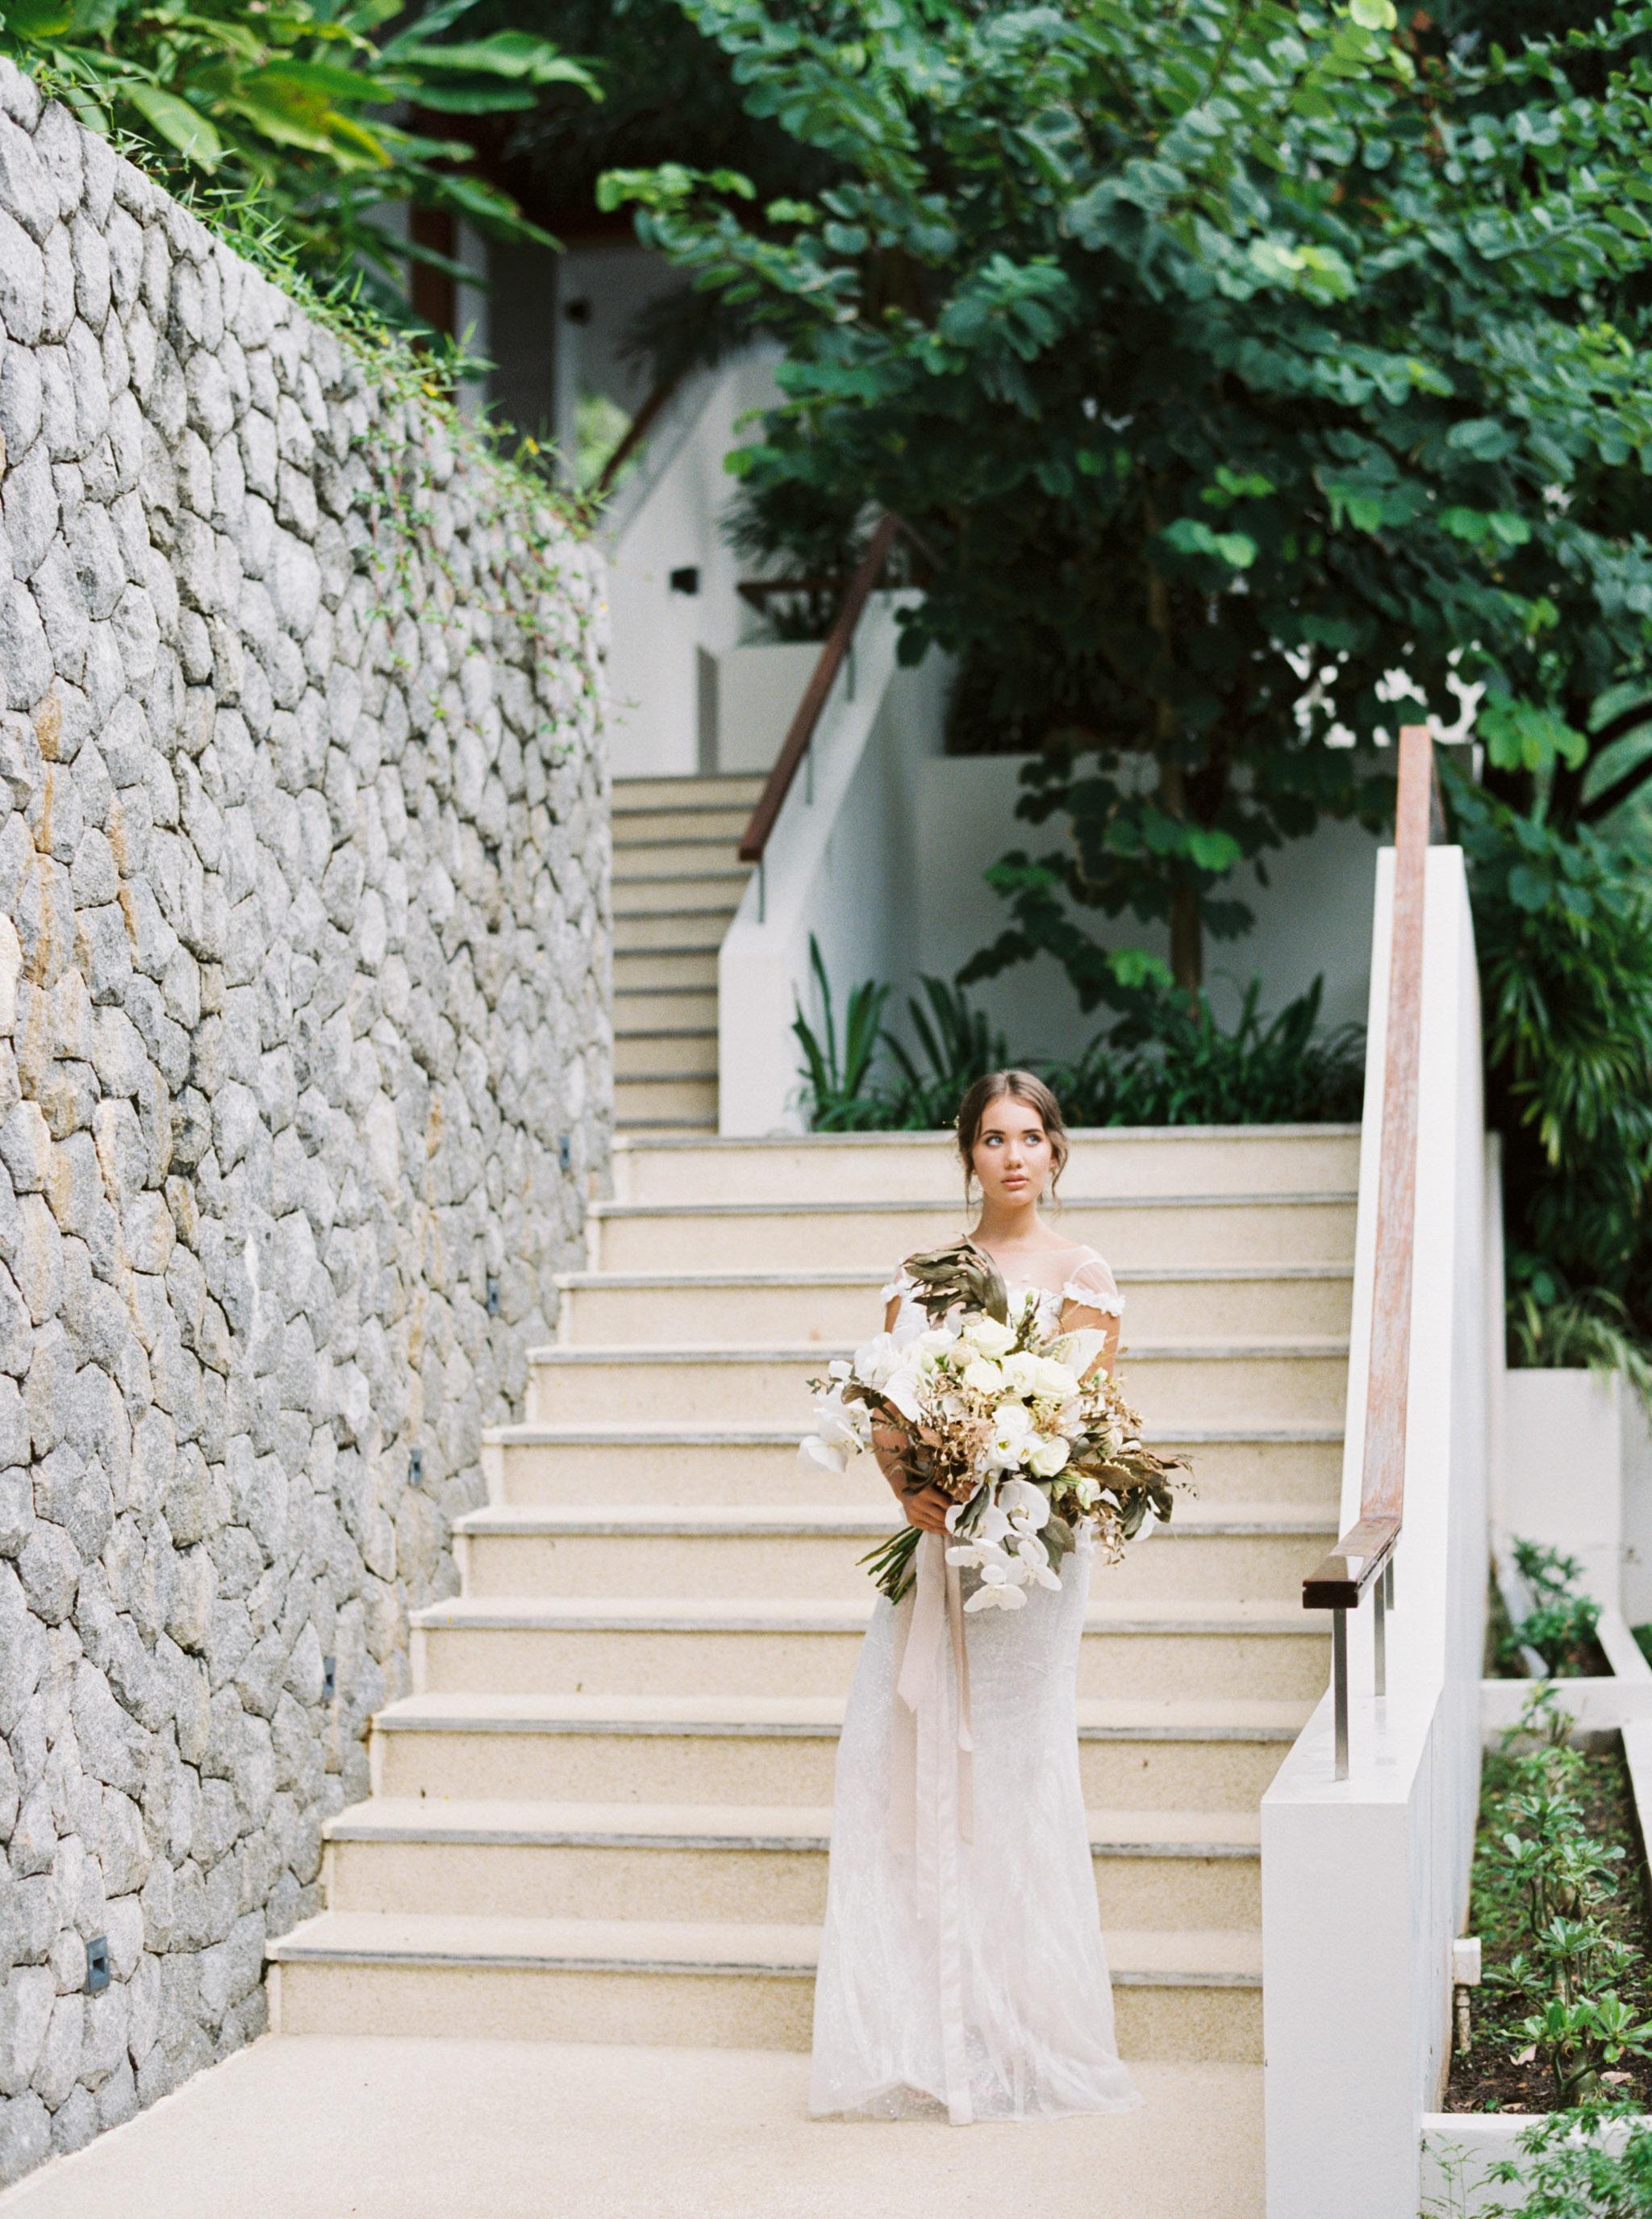 Destination Wedding Phuket Thailand Fine Art Film Photographer Sheri McMahon-00025-25.jpg